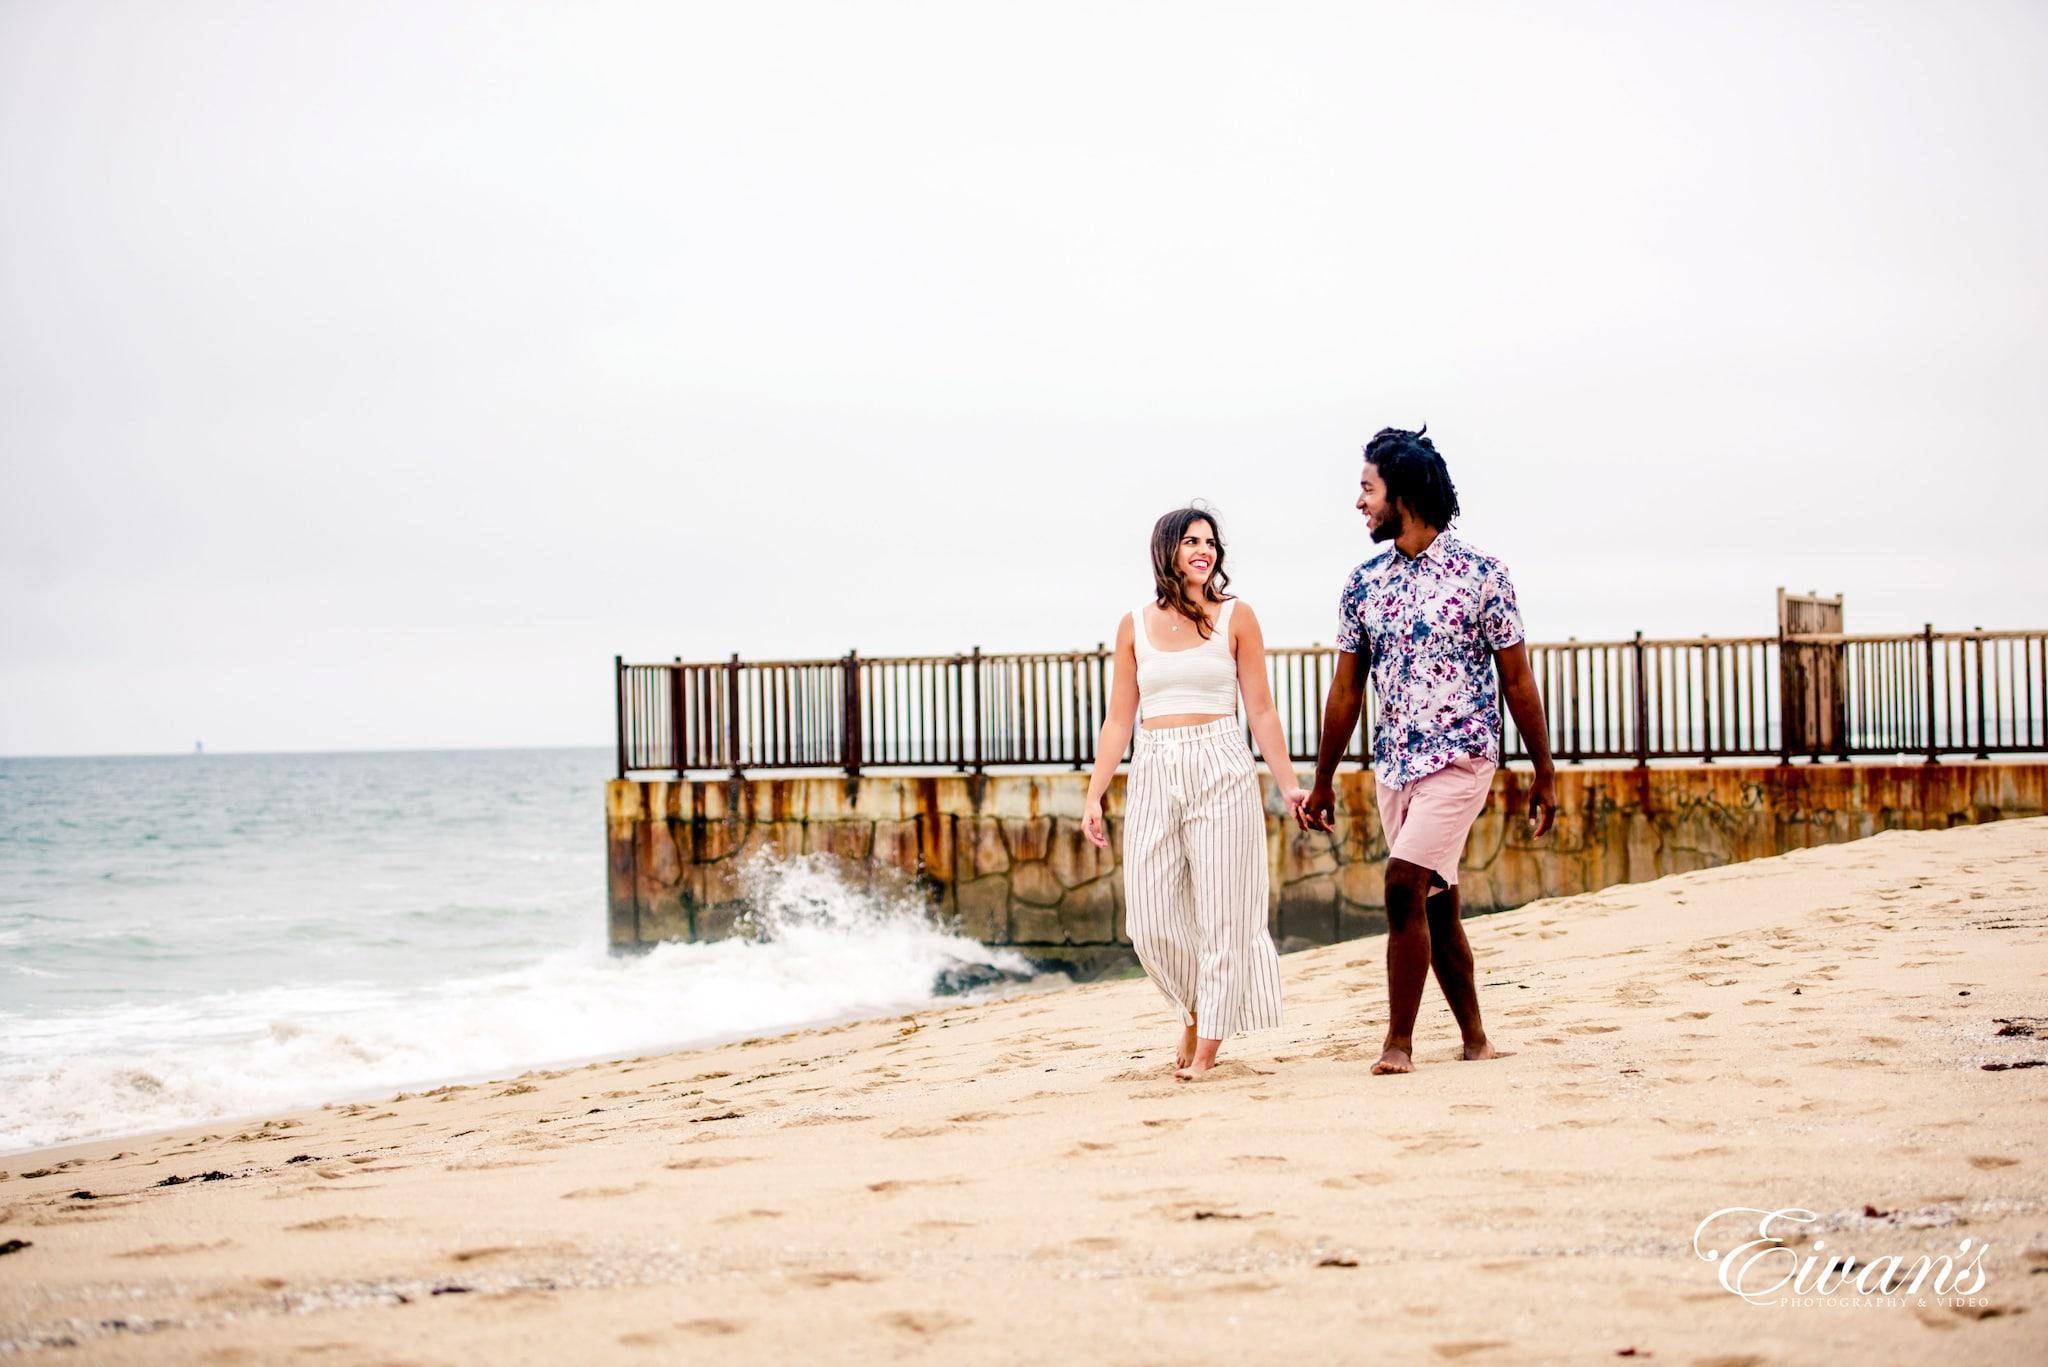 3 women standing on beach during daytime